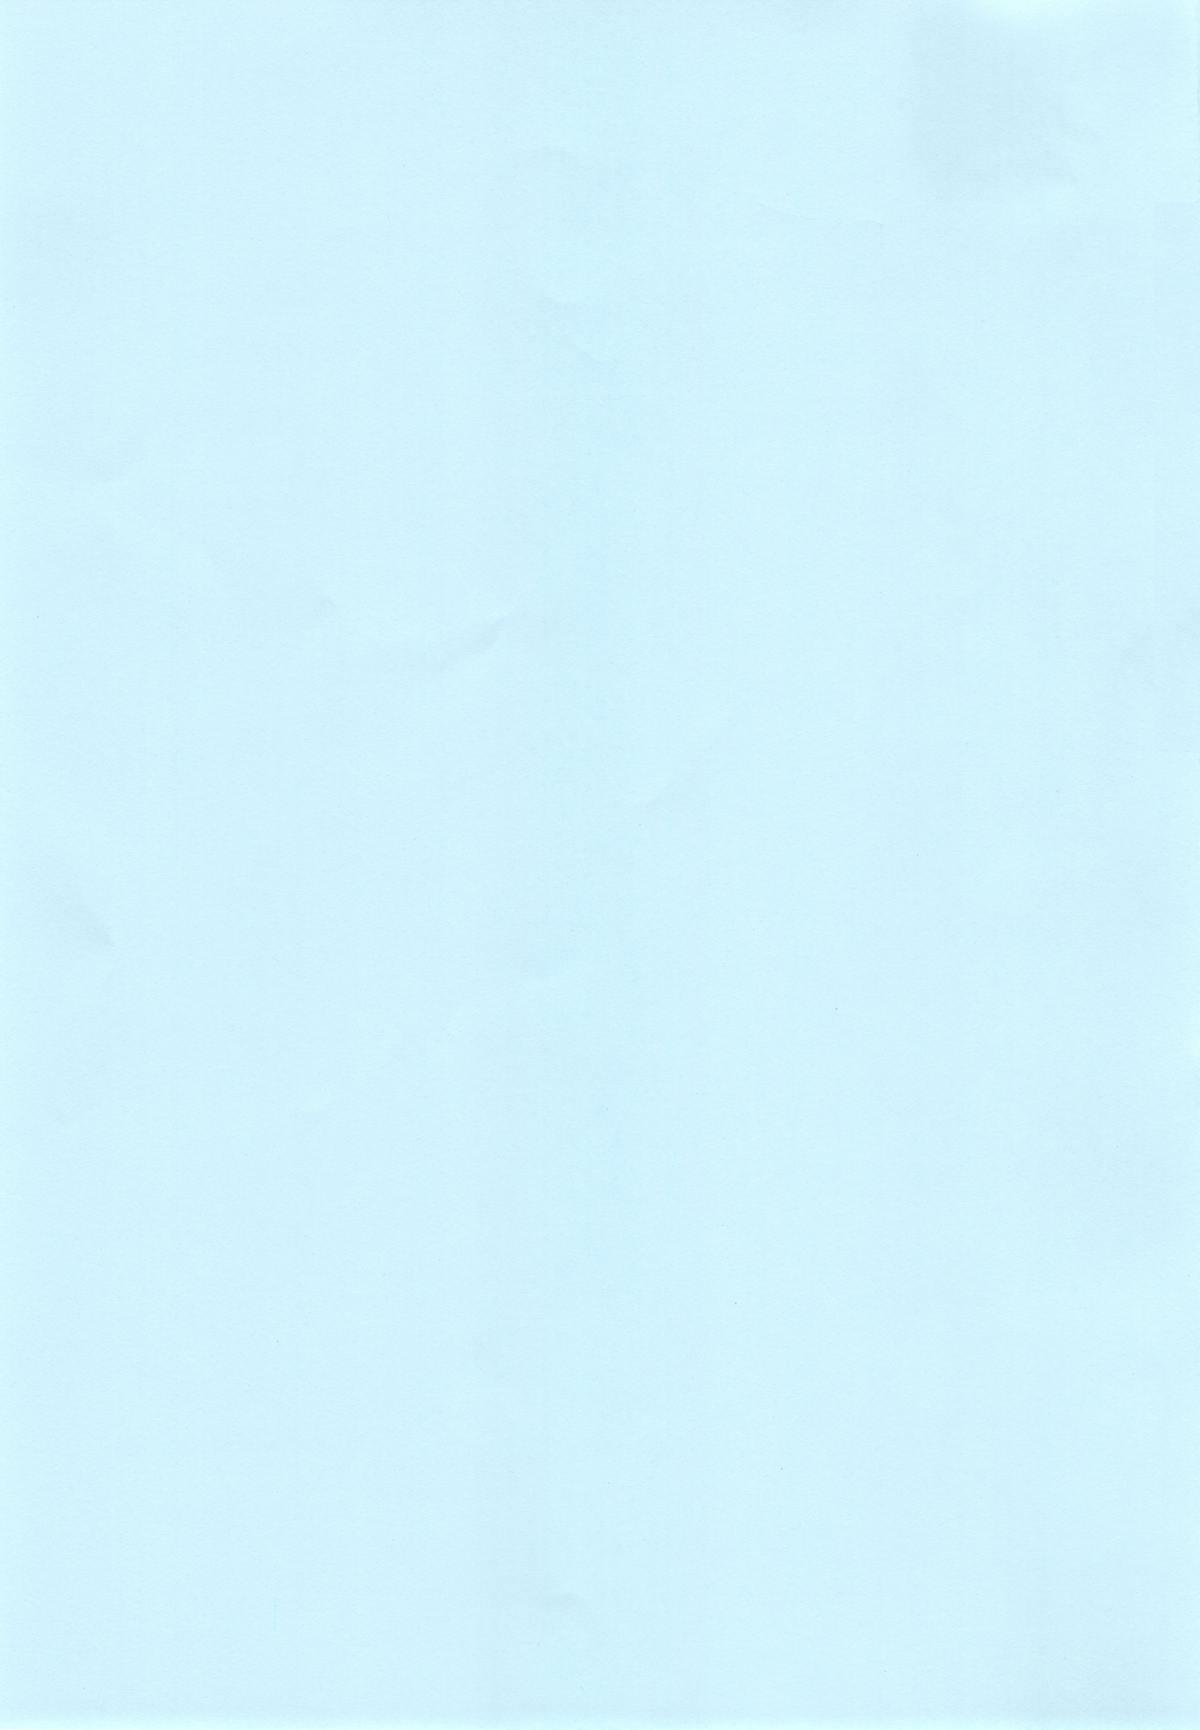 BREAK BLUE MARRON SPARRING 1